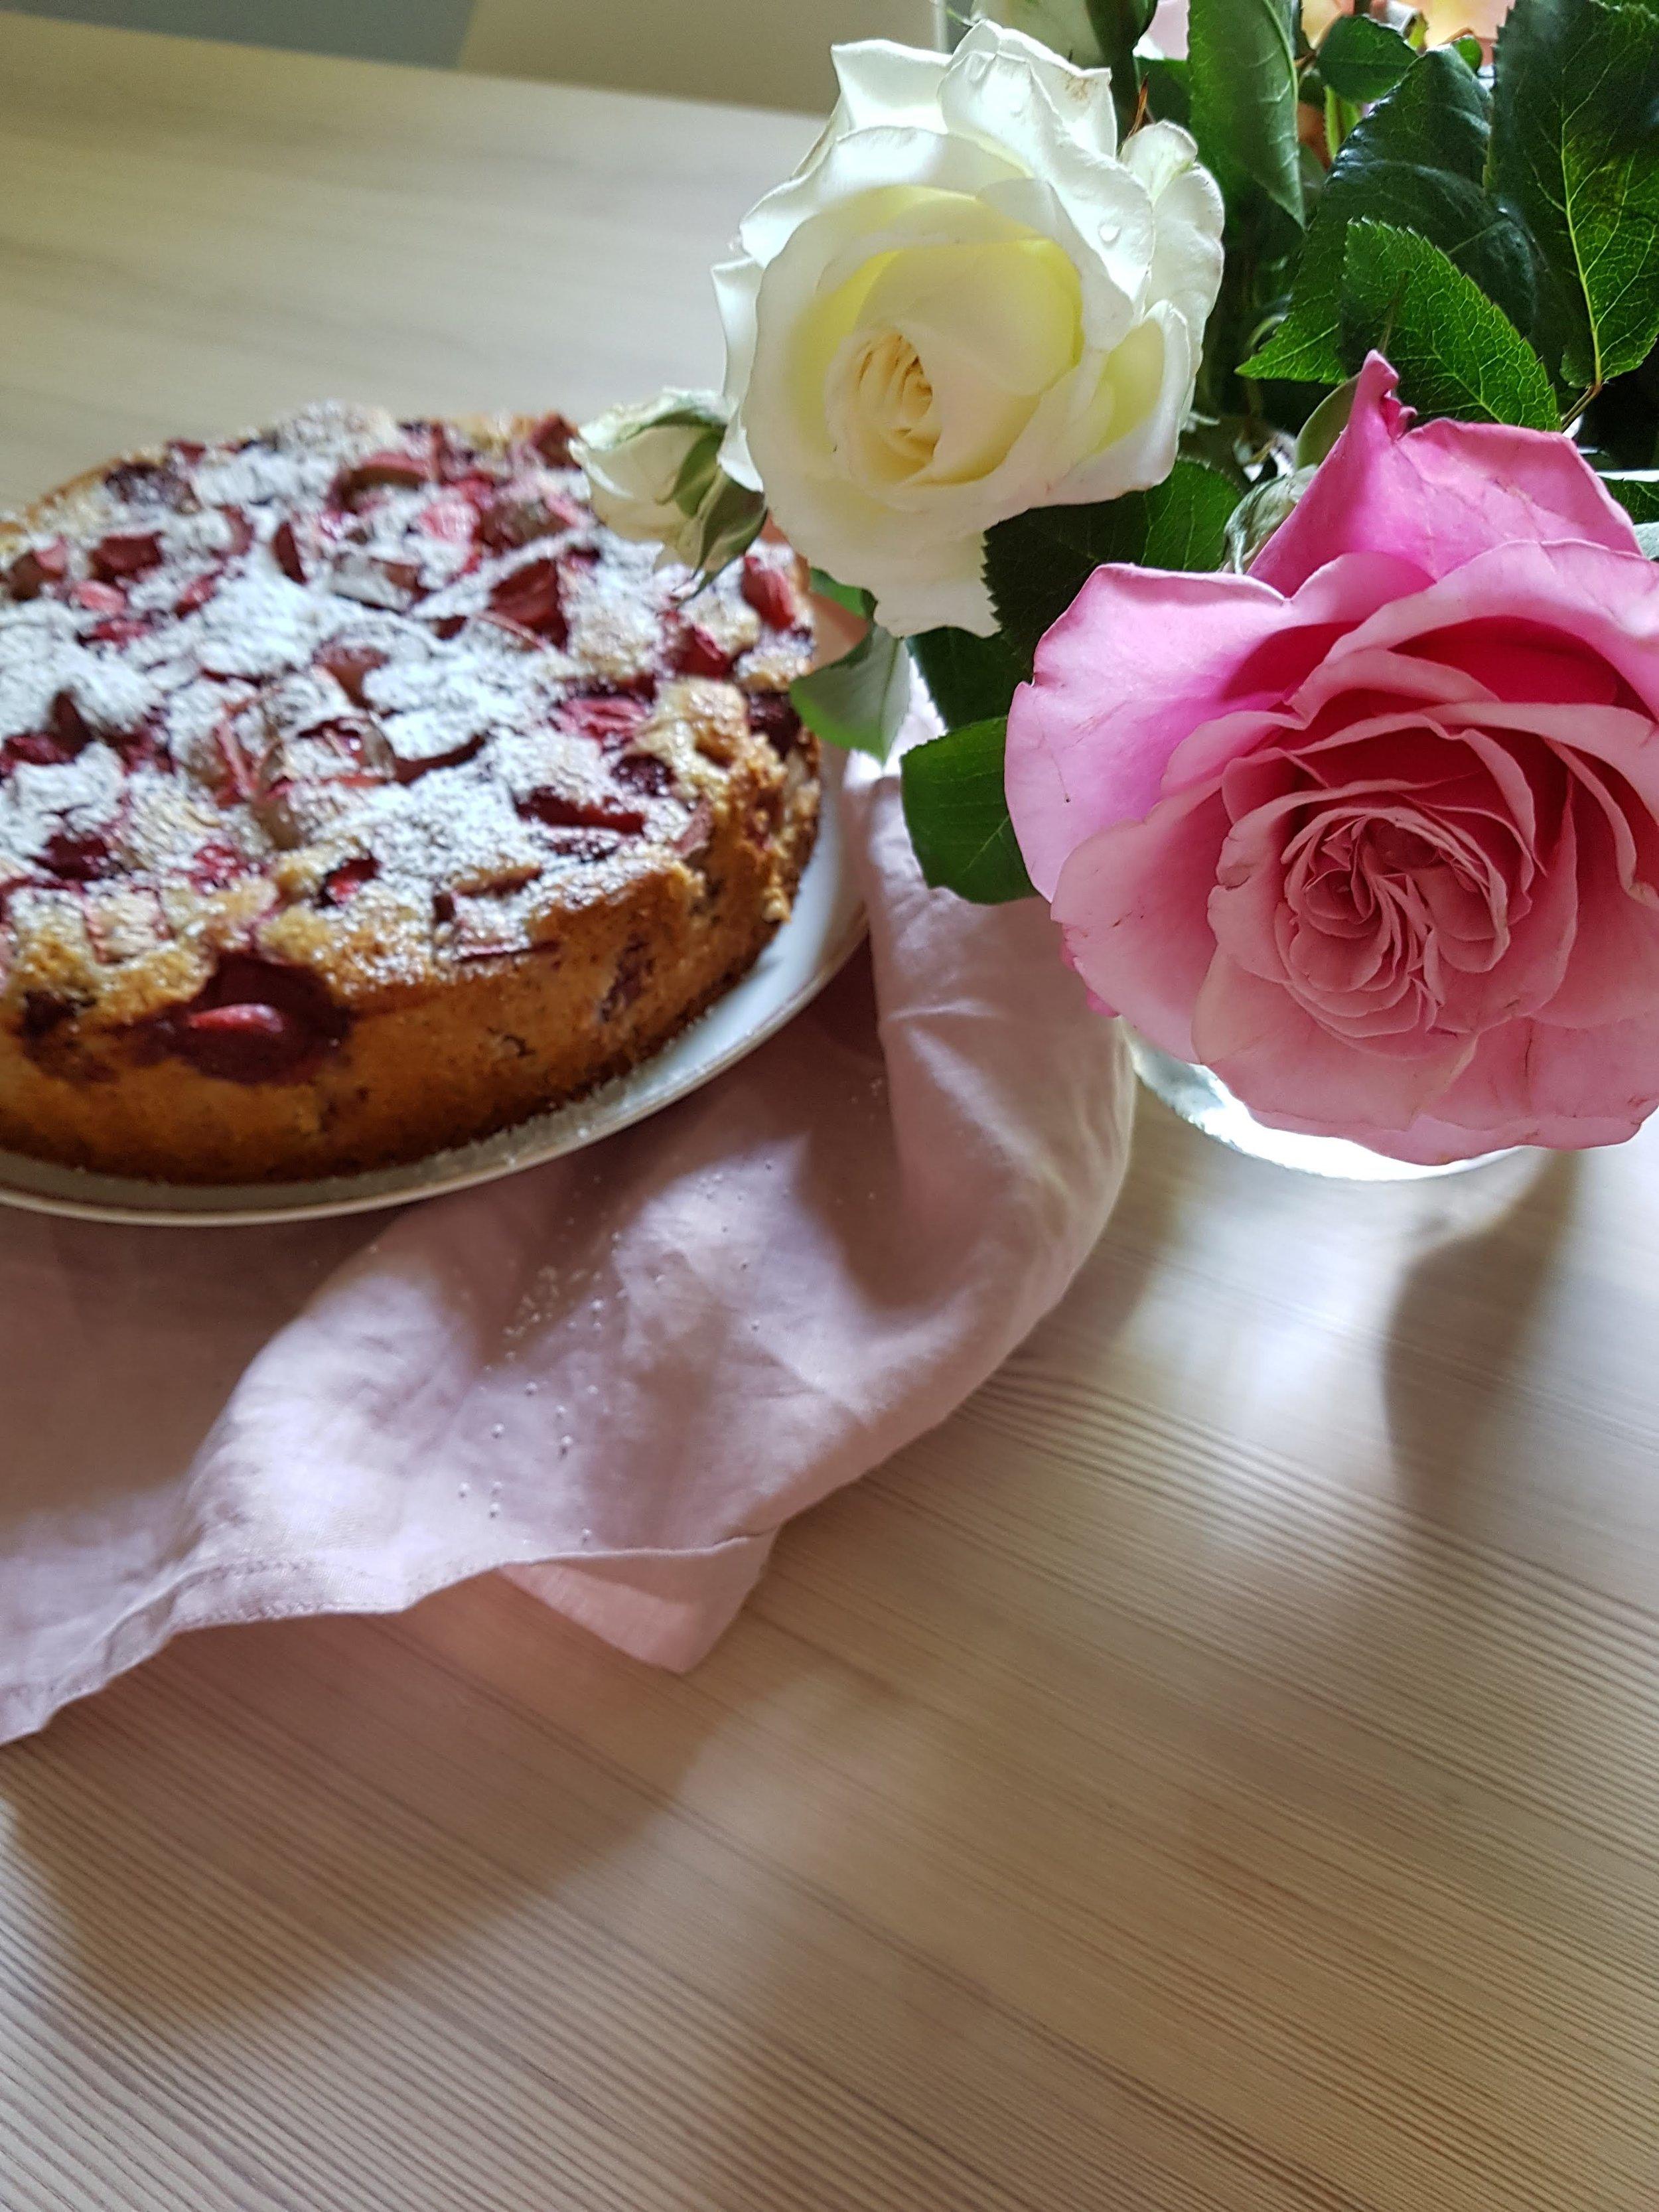 Rhabarber-Kuchen